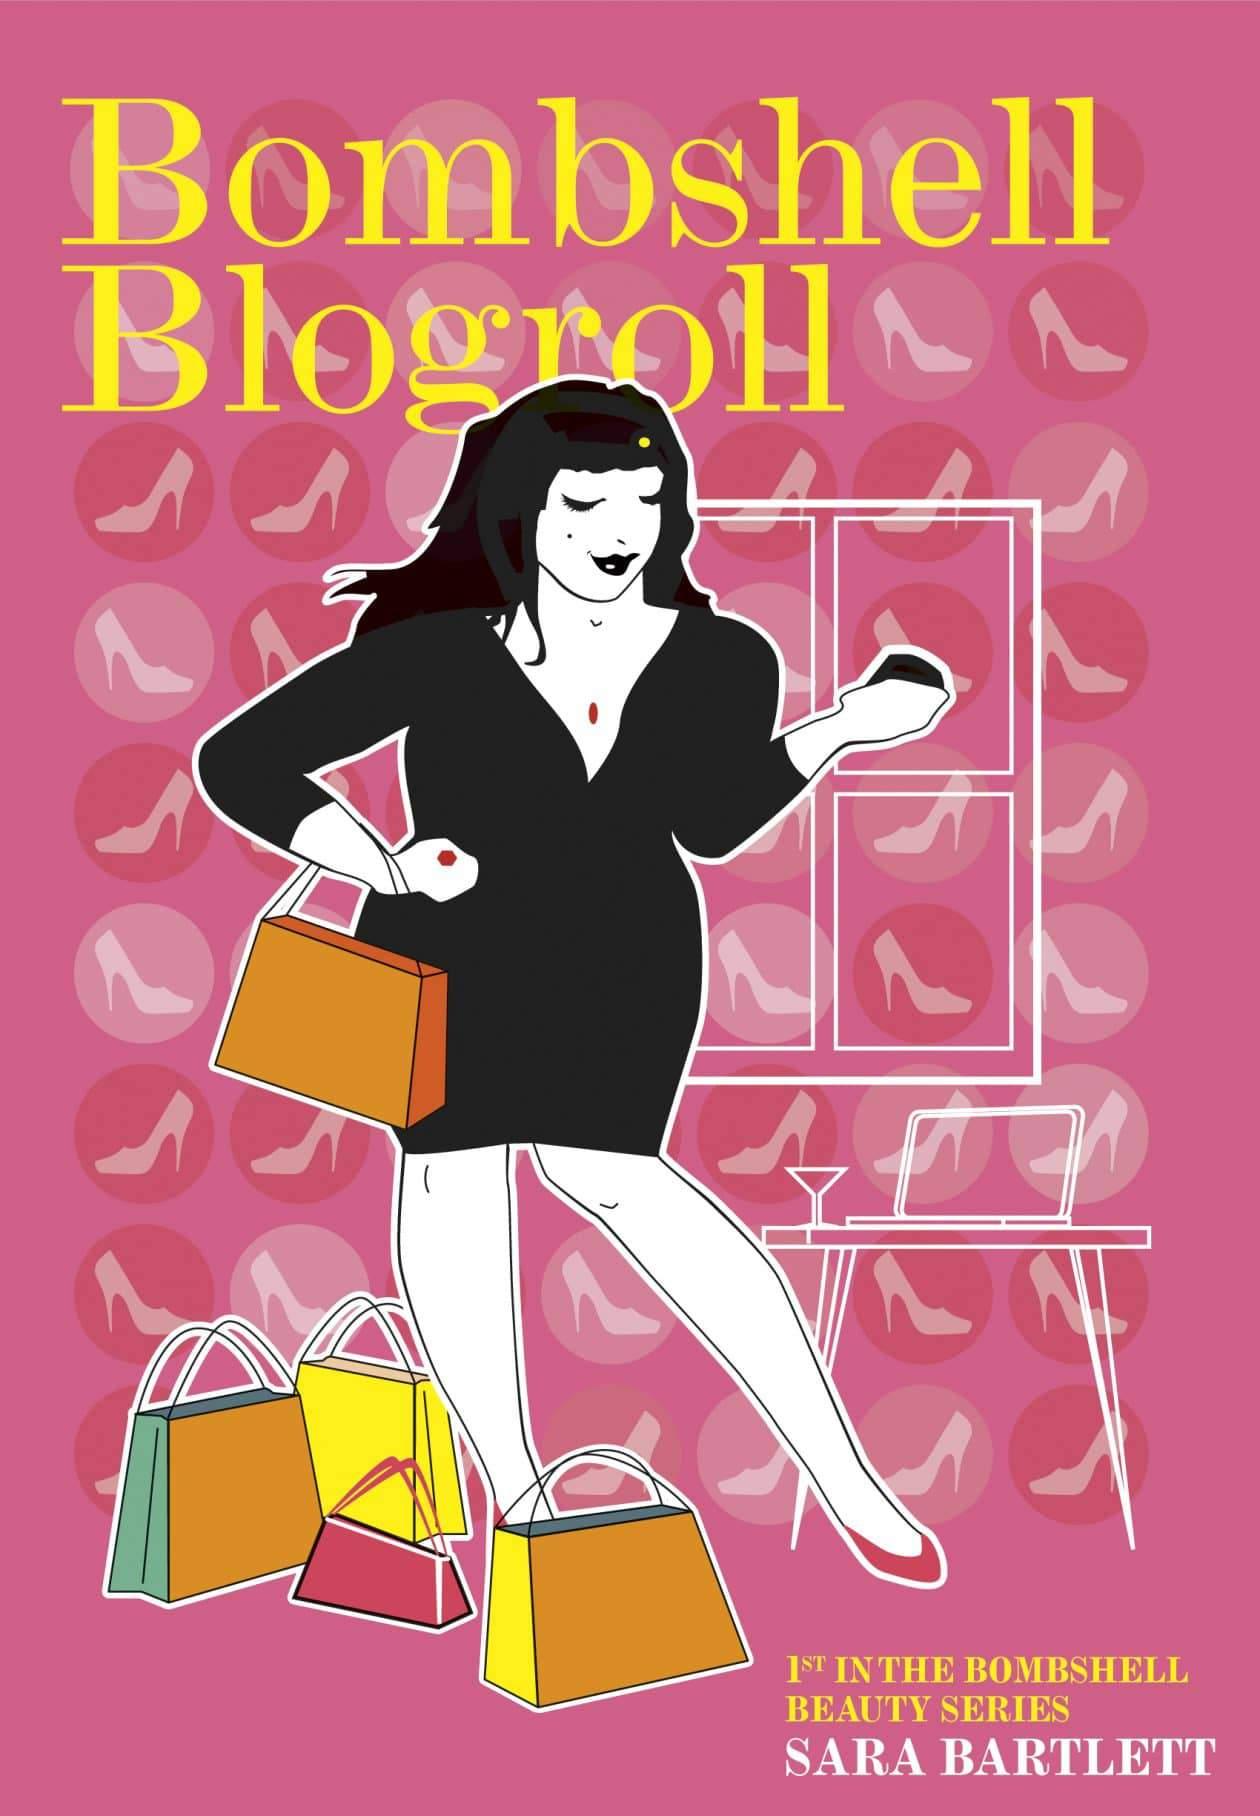 Plus Size Blogger, Bombshell Beauty Releases First Novella: Bombshell Blogroll